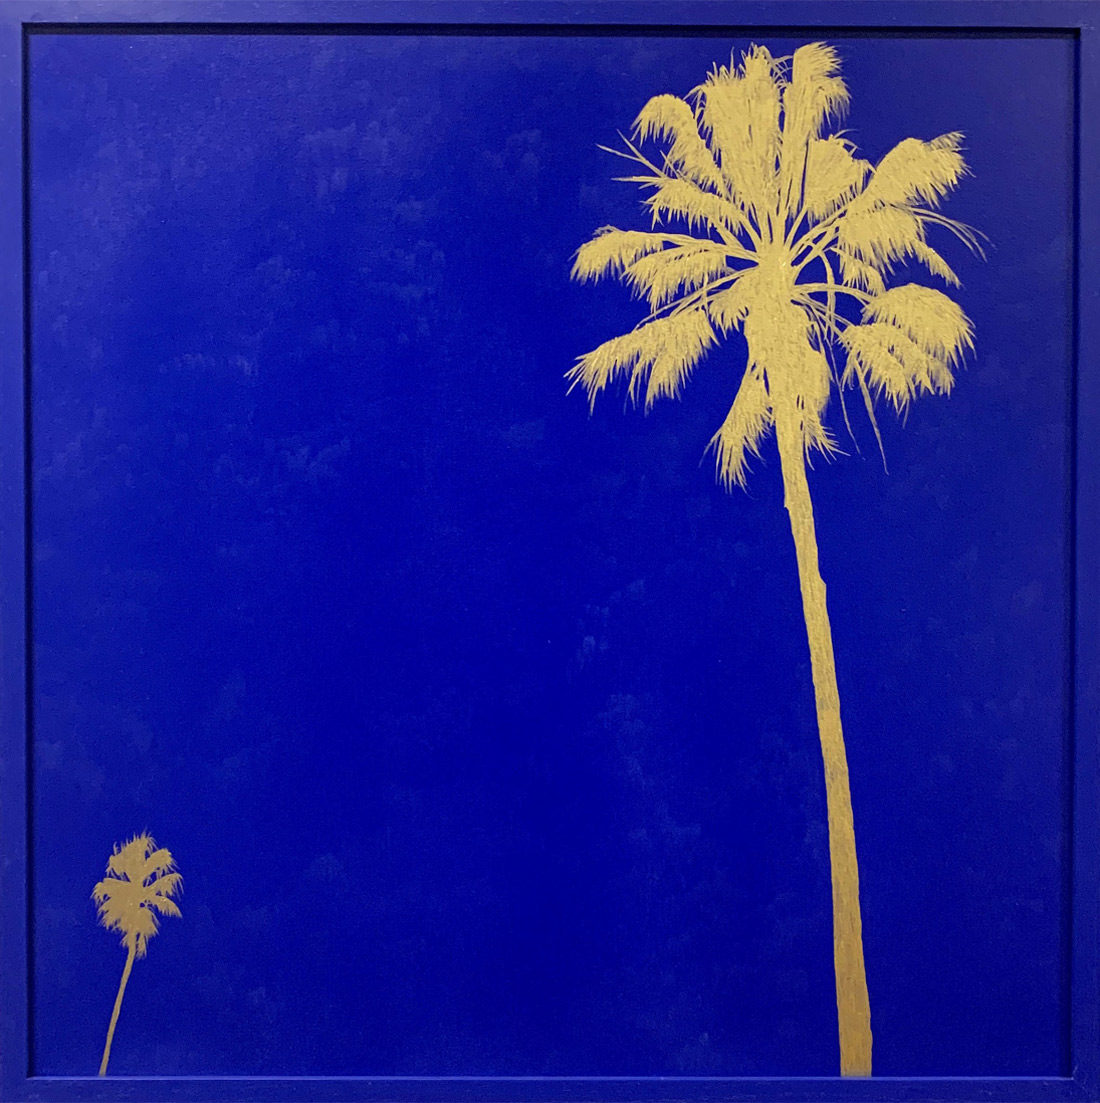 Grands palmtrees III bleu - Tableau- Hubert Jouzeau